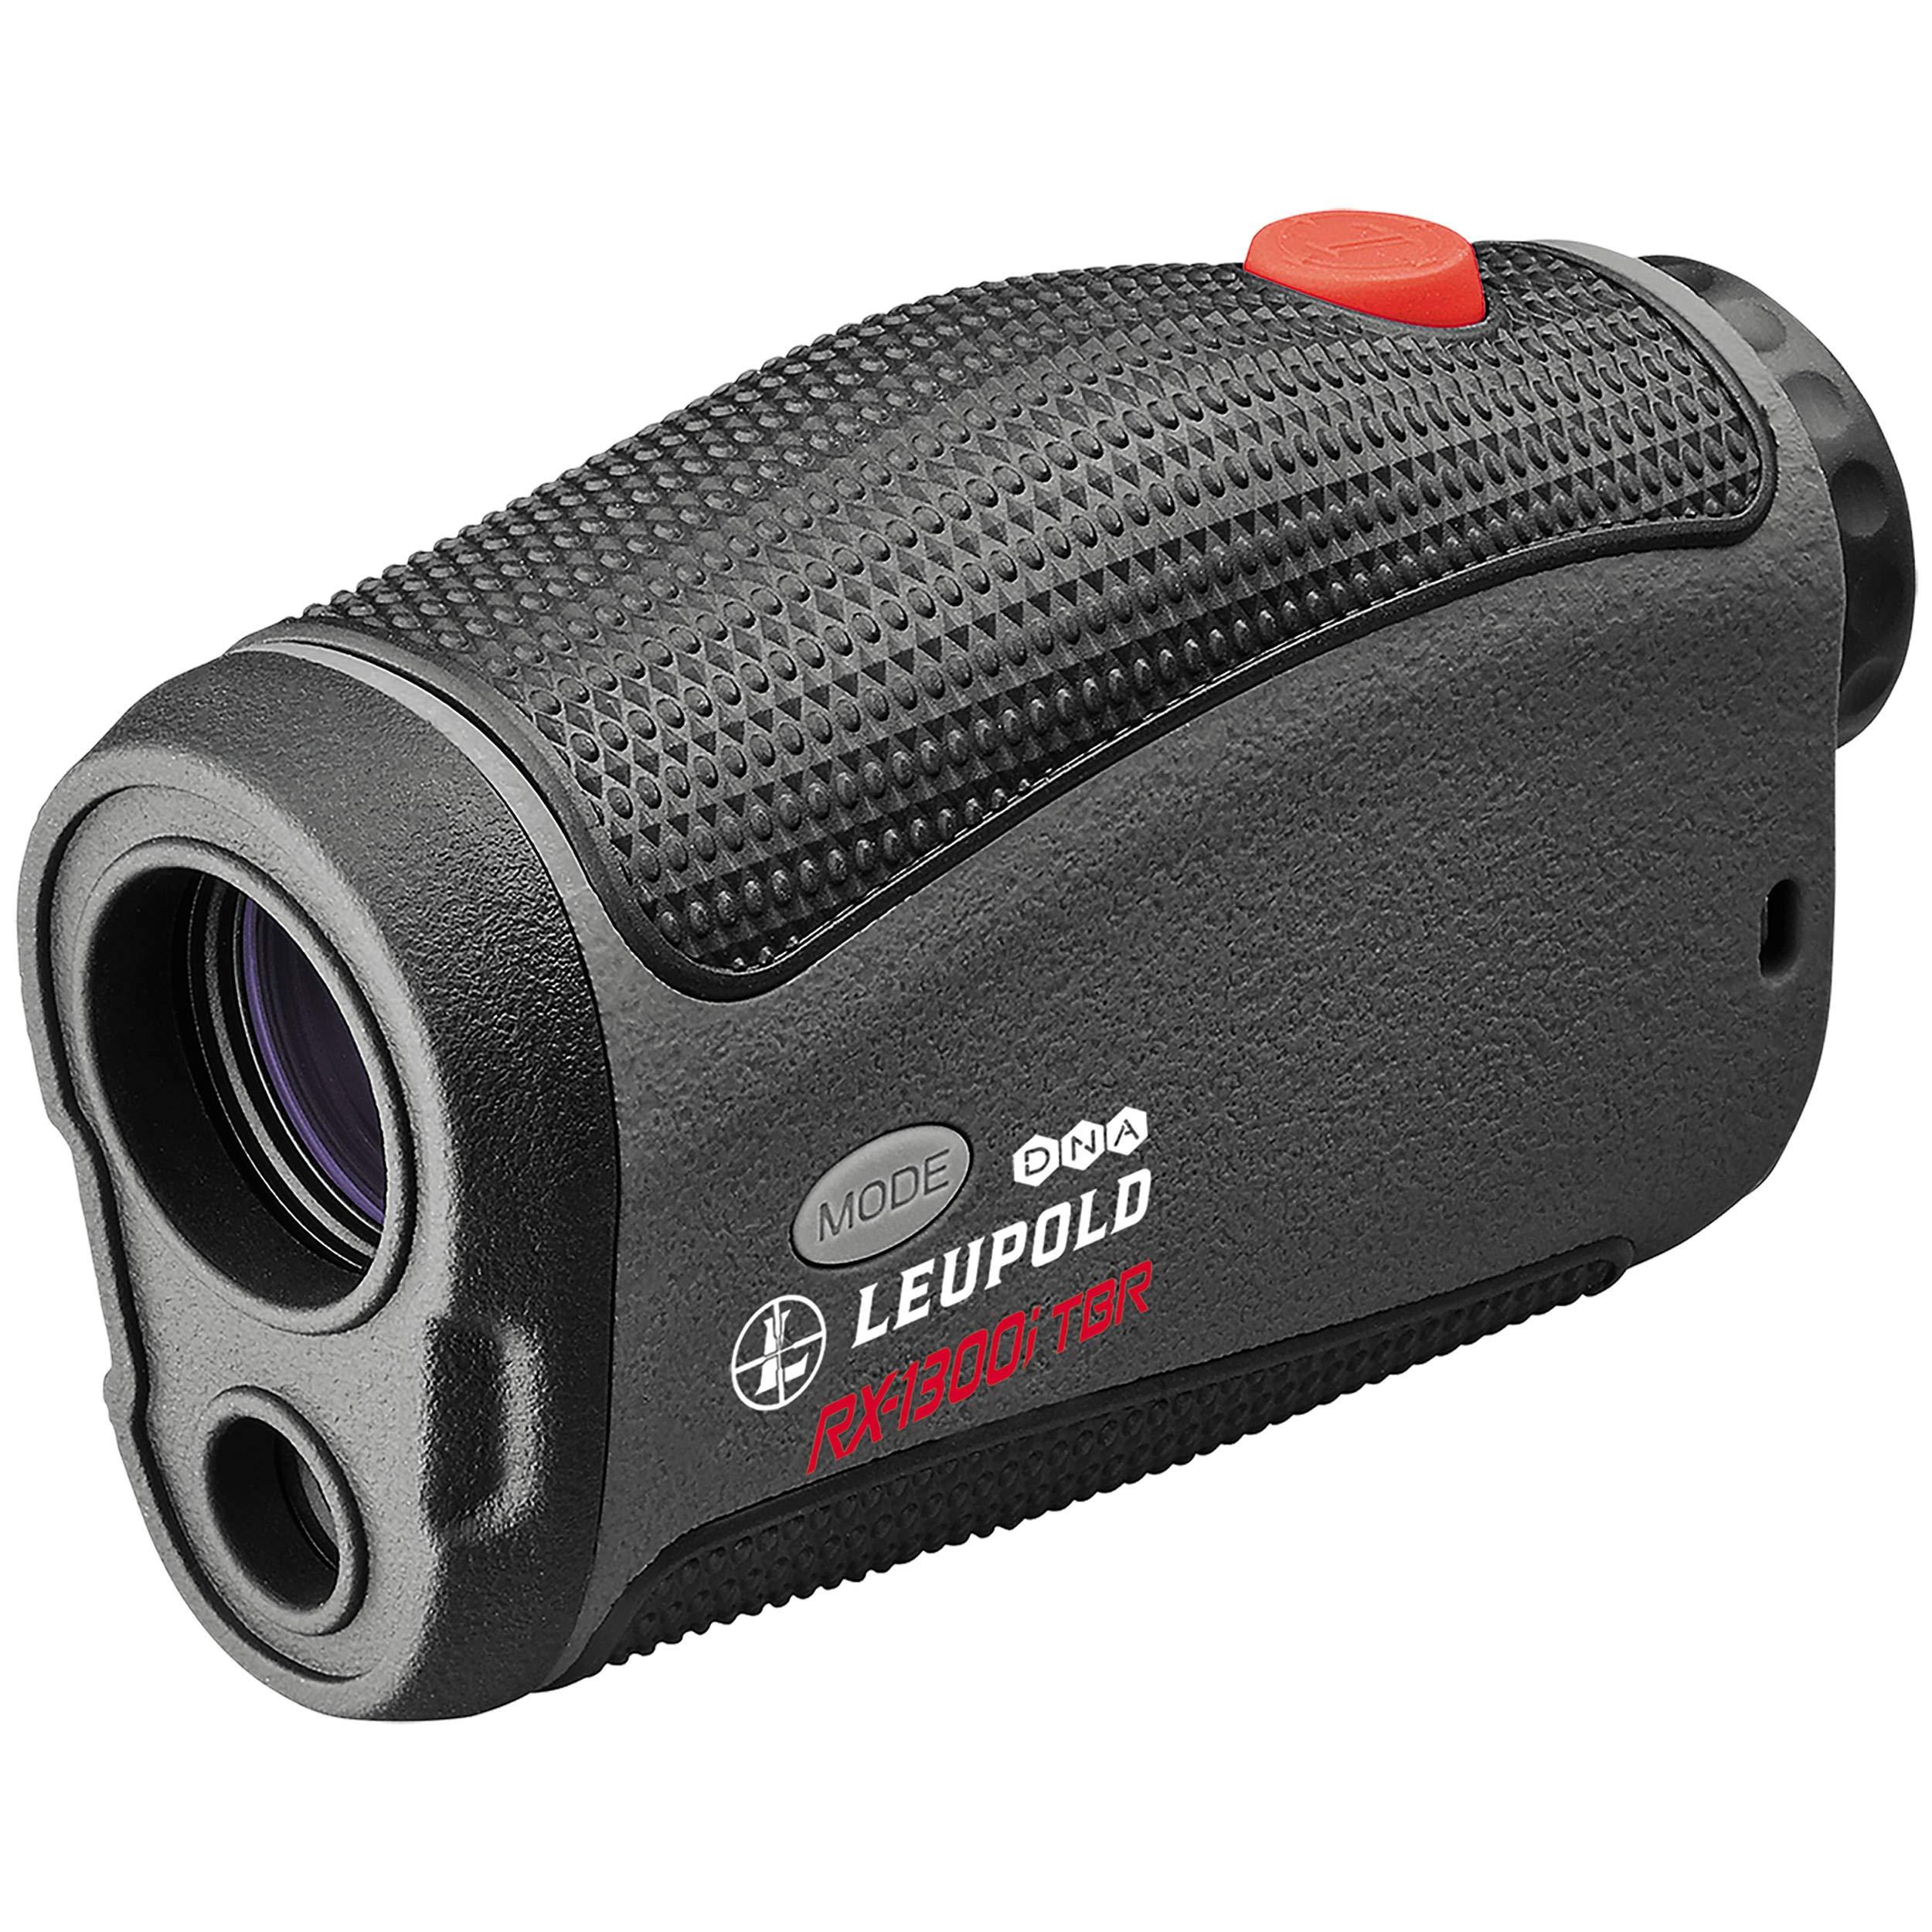 Leupold RX-1300i TBR Laser Rangefinder with DNA, Black/Gray by Leupold